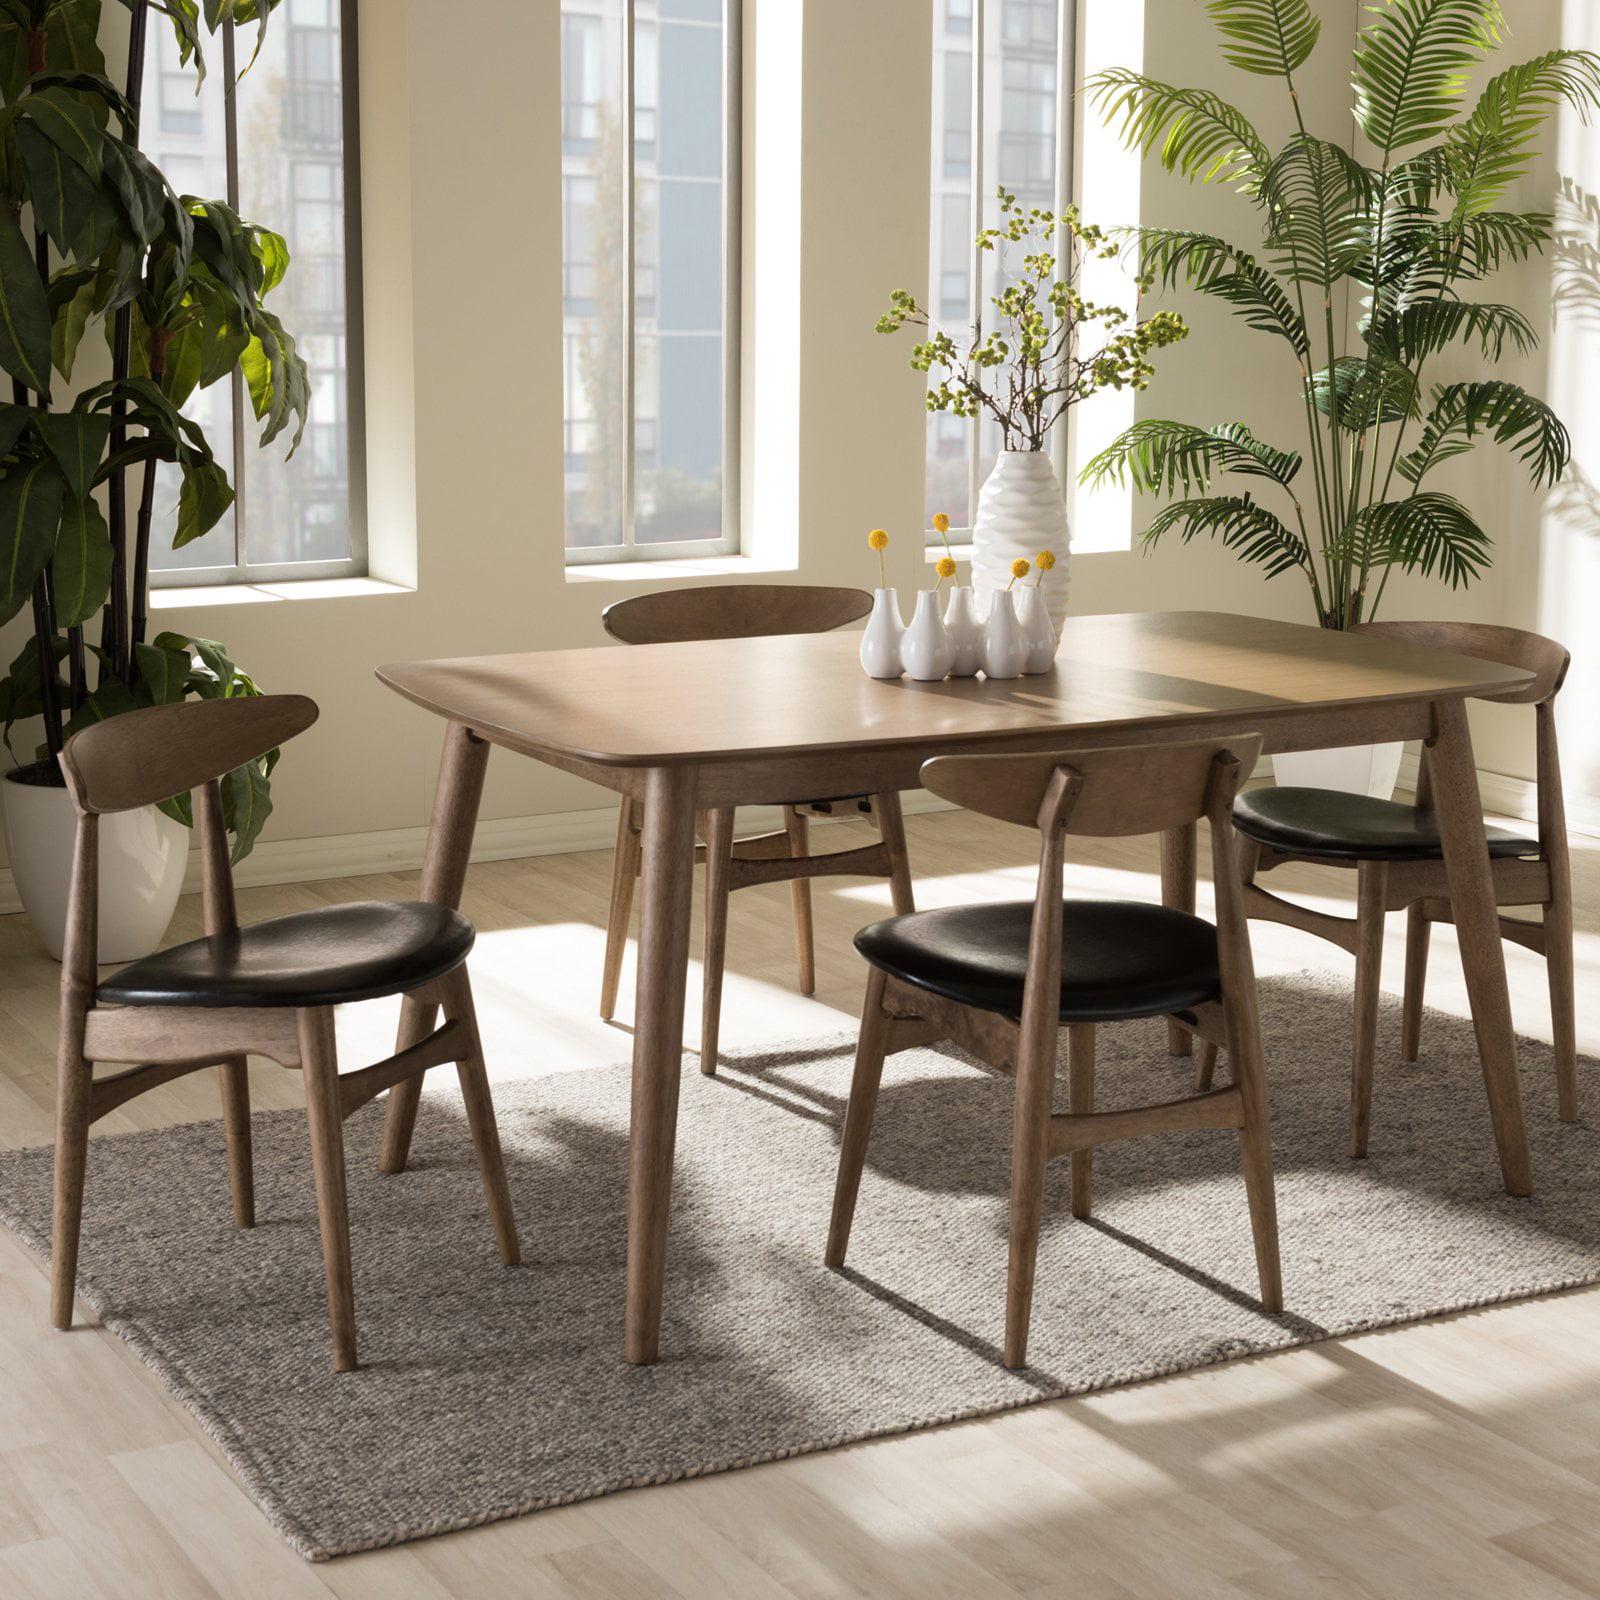 Baxton Studio Edna 5 Piece Dining Table Set